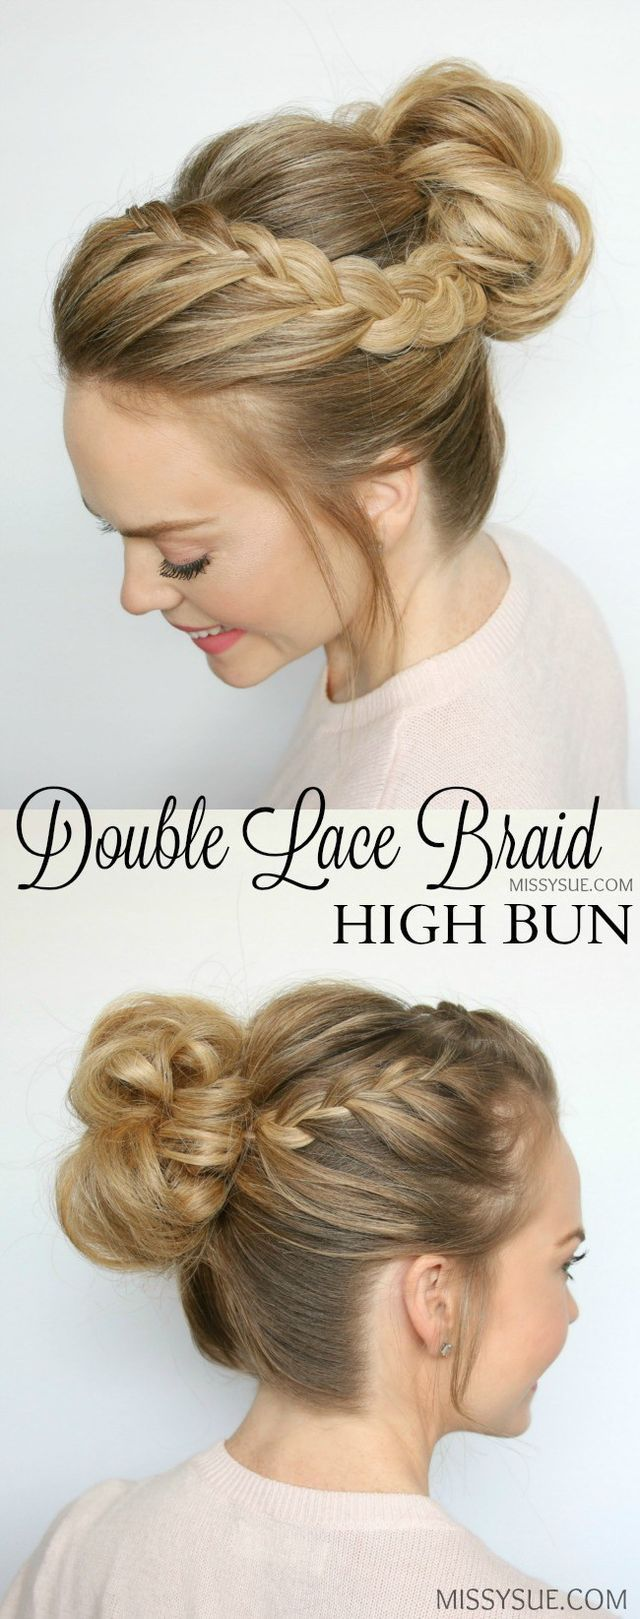 Double lace braid high bun missy sue high bun tutorials double lace braid high bun missy sue baditri Gallery